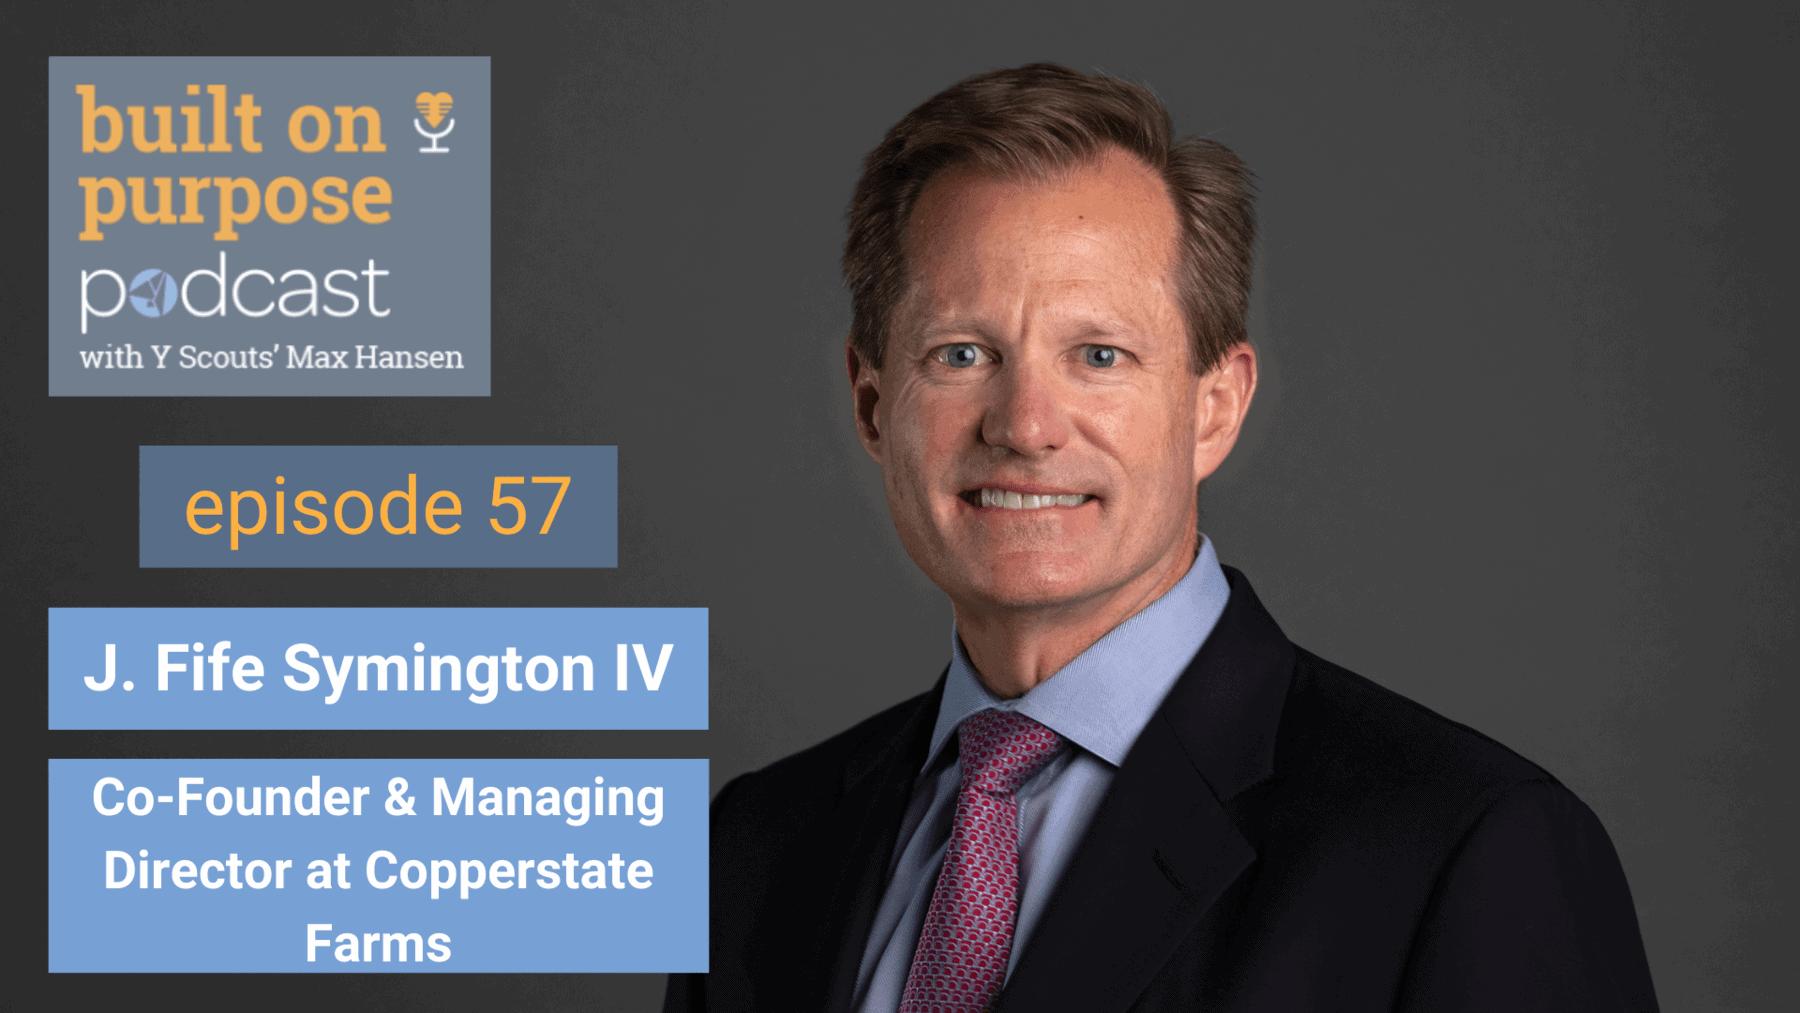 Episode 57 - J. Fife Symington IV - Co-Founder & Managing Director at Copperstate Farms